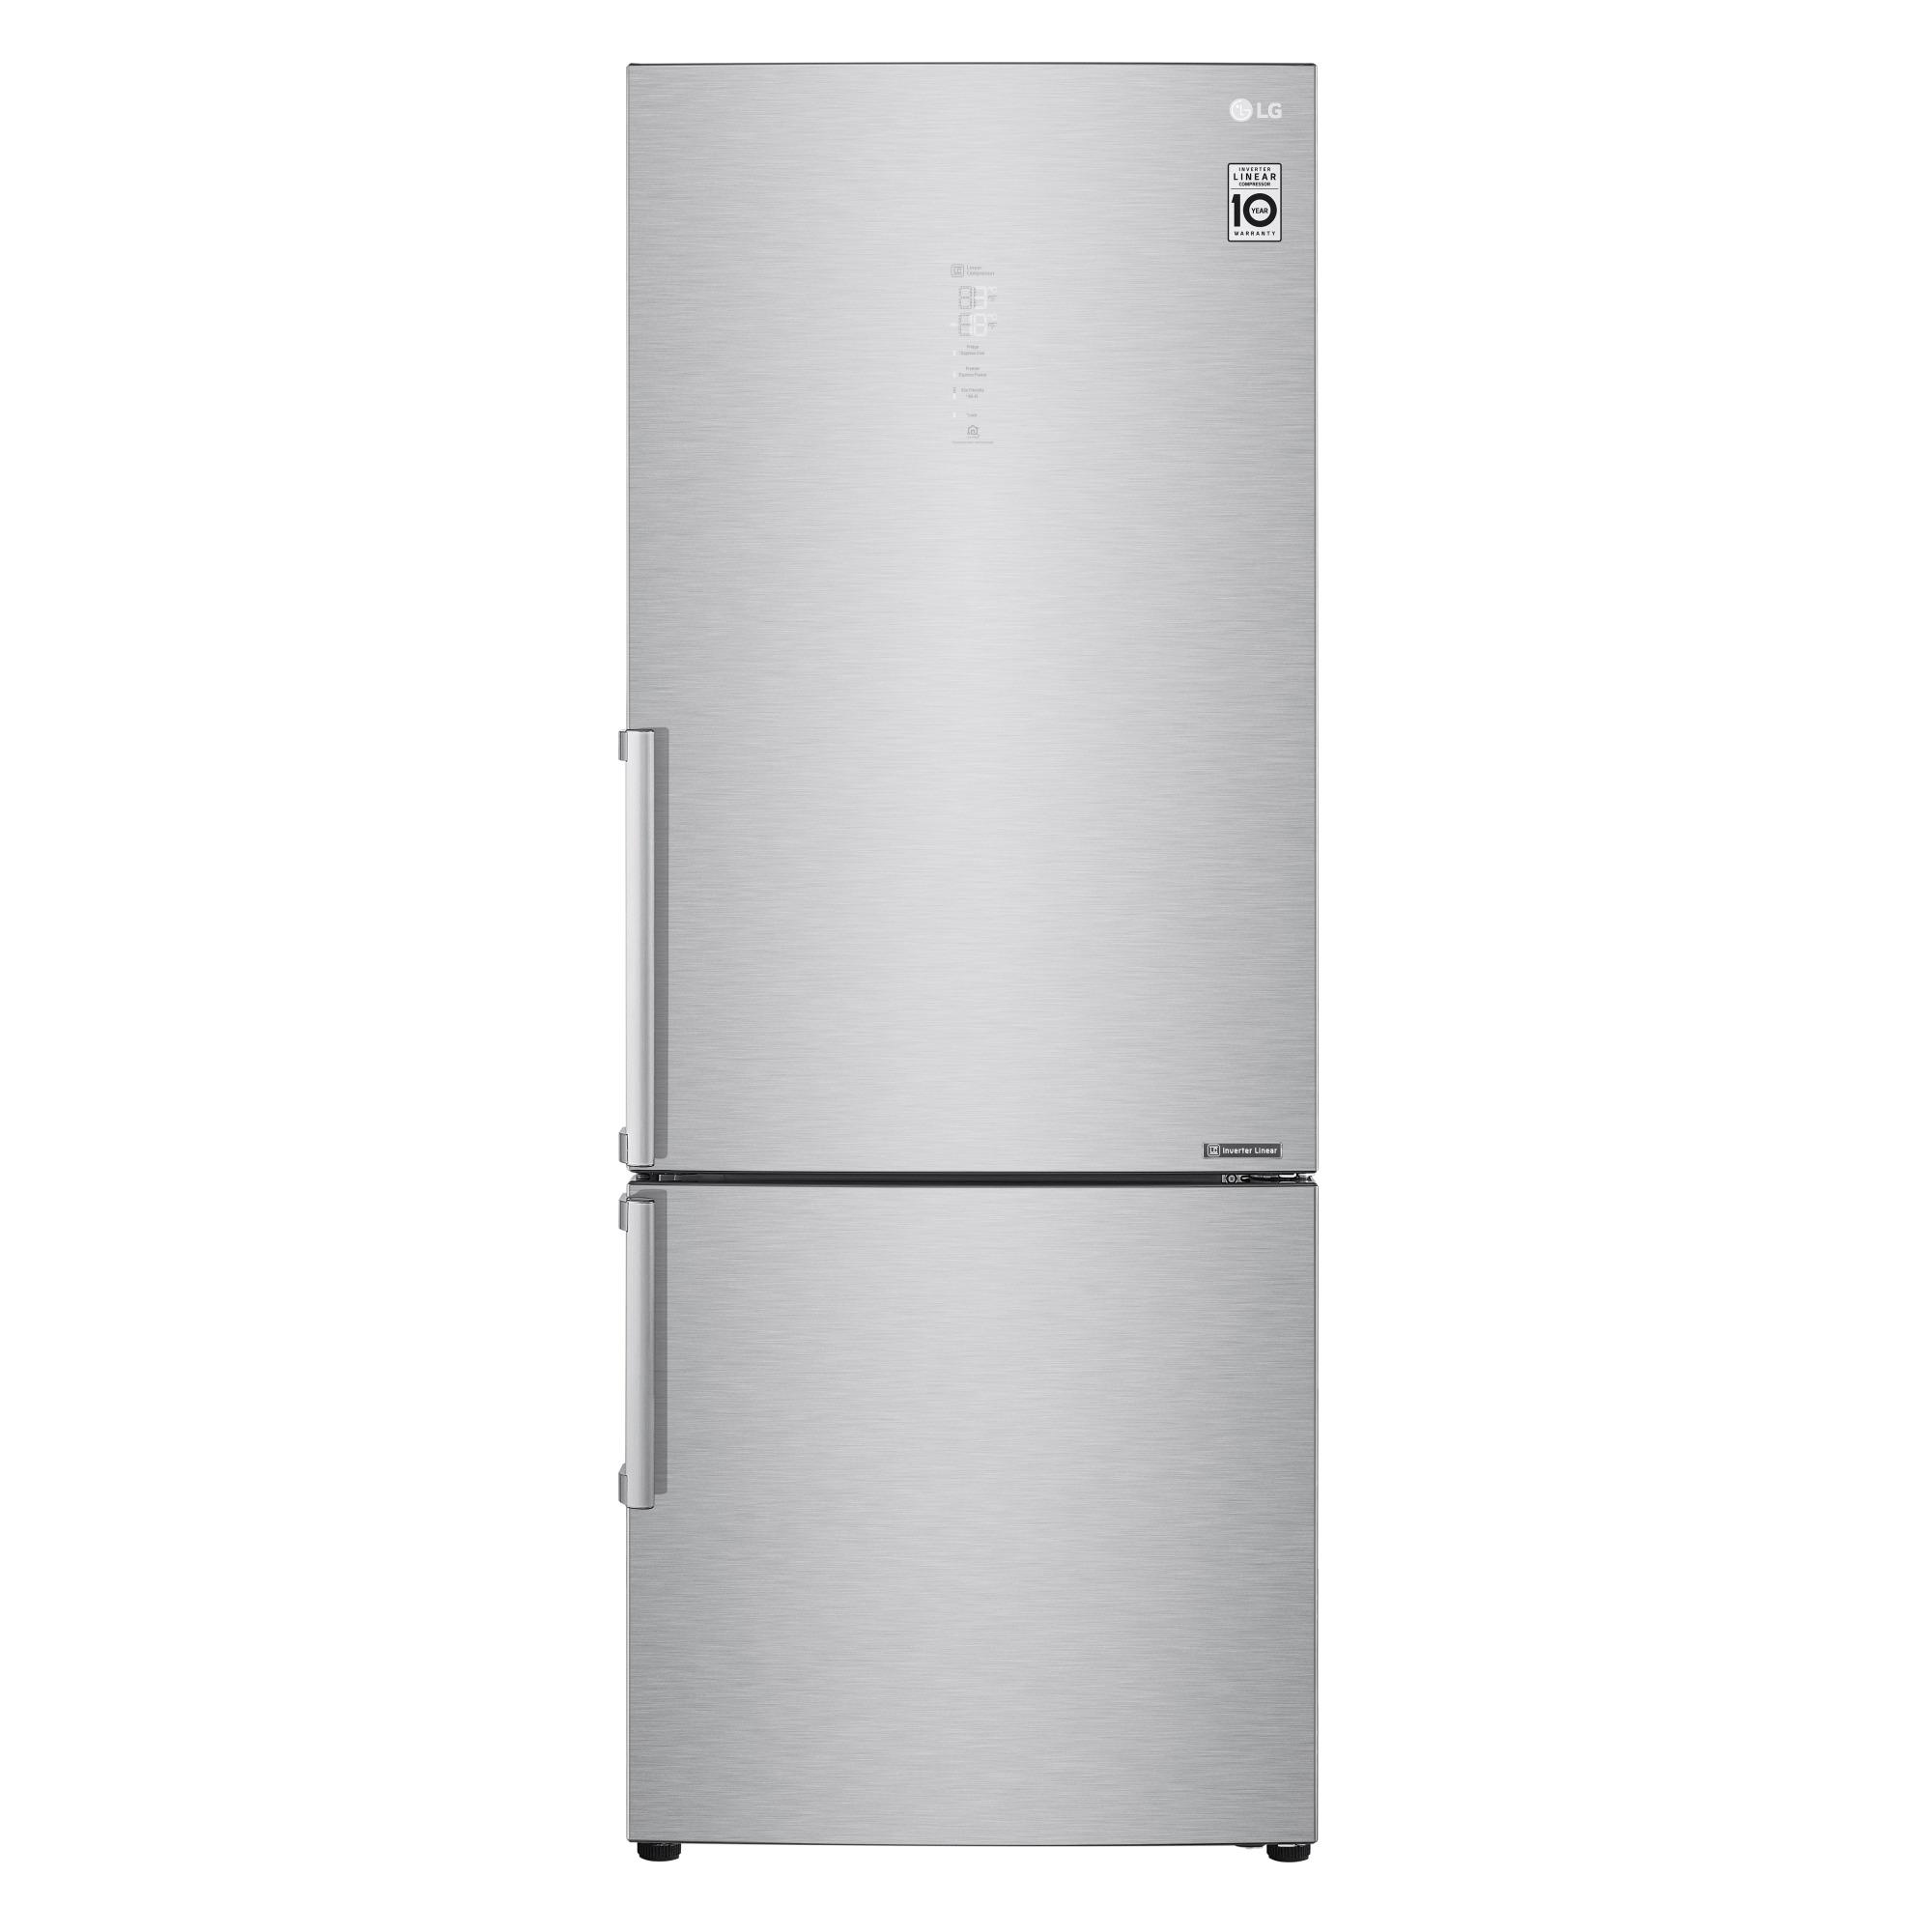 GeladeiraRefrigerador LG Frost Free Inverse 2 Portas Painel Touch Screen 451L Inox 220V - B659BSB